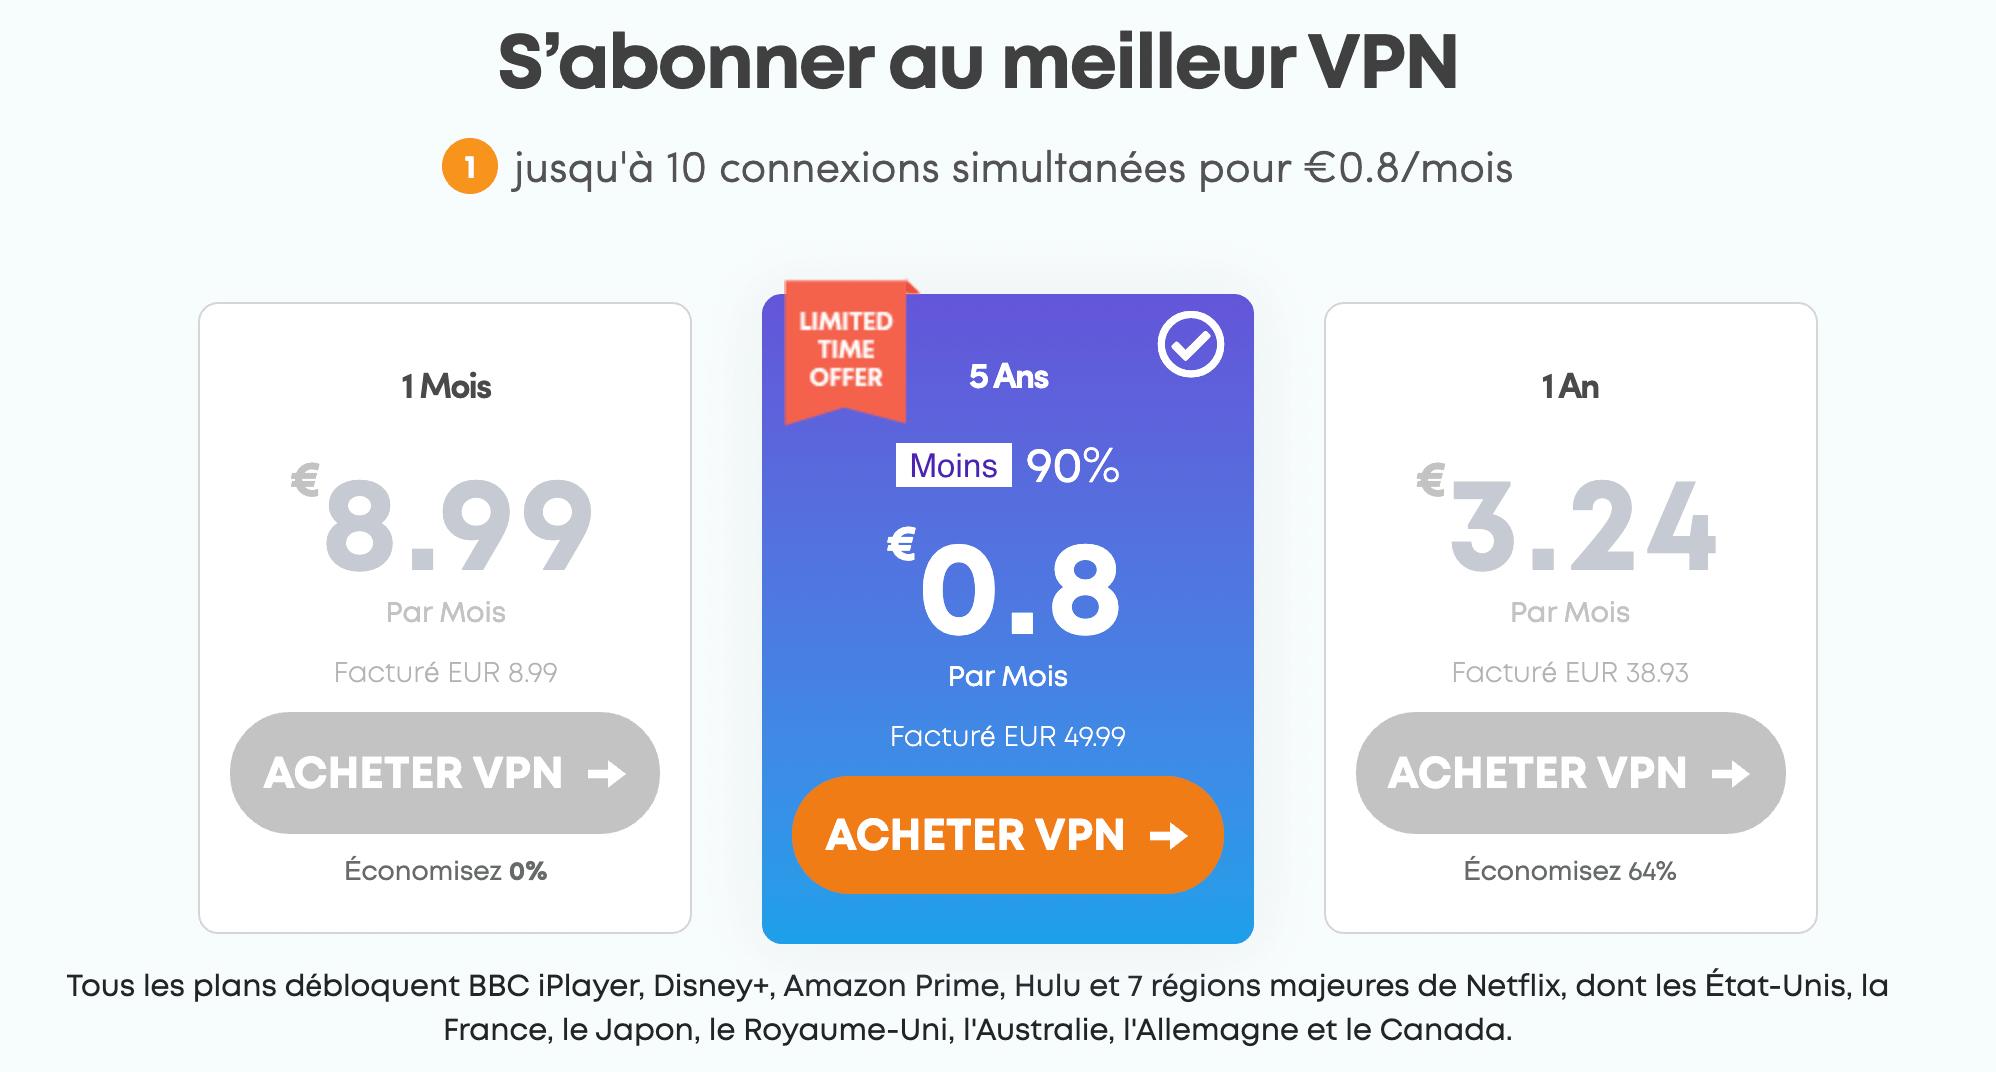 promotion vpn ivacy bon plan tarif prix